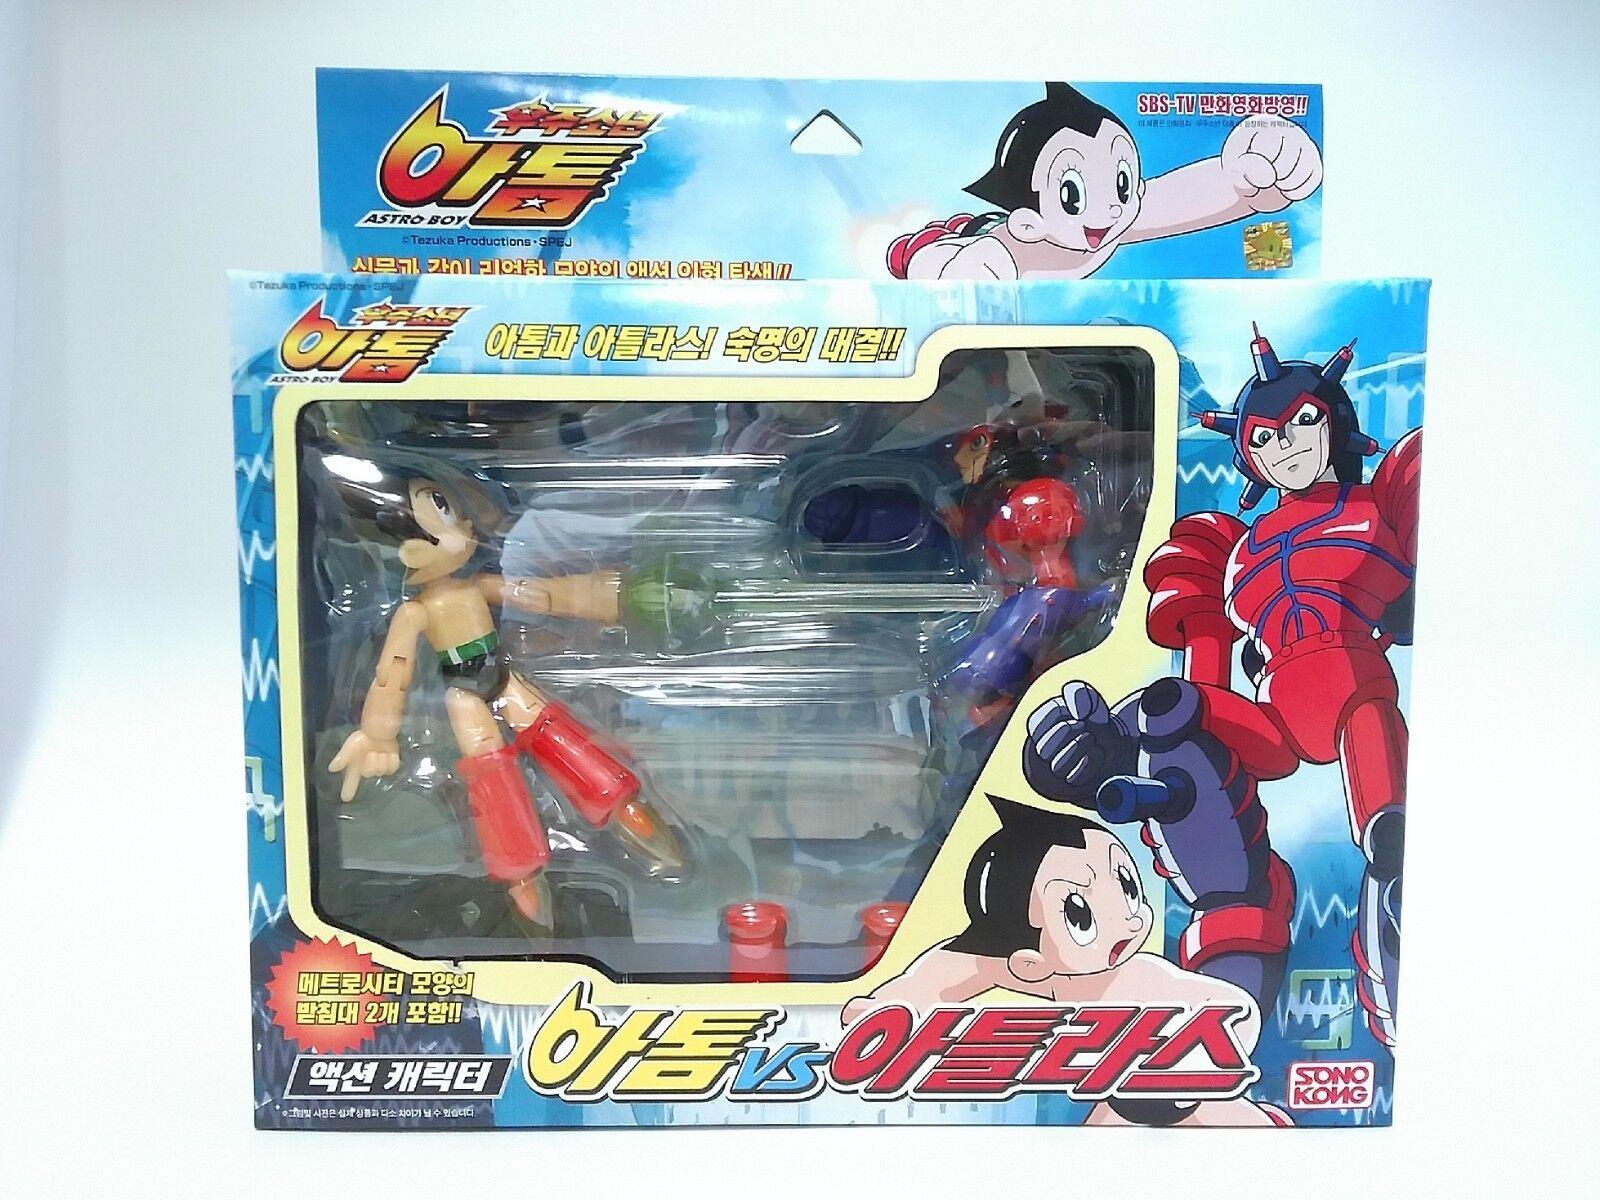 TAKARA TOMY 2003 Mighty ATOM ASTRO BOY vs ATLAS Action figures